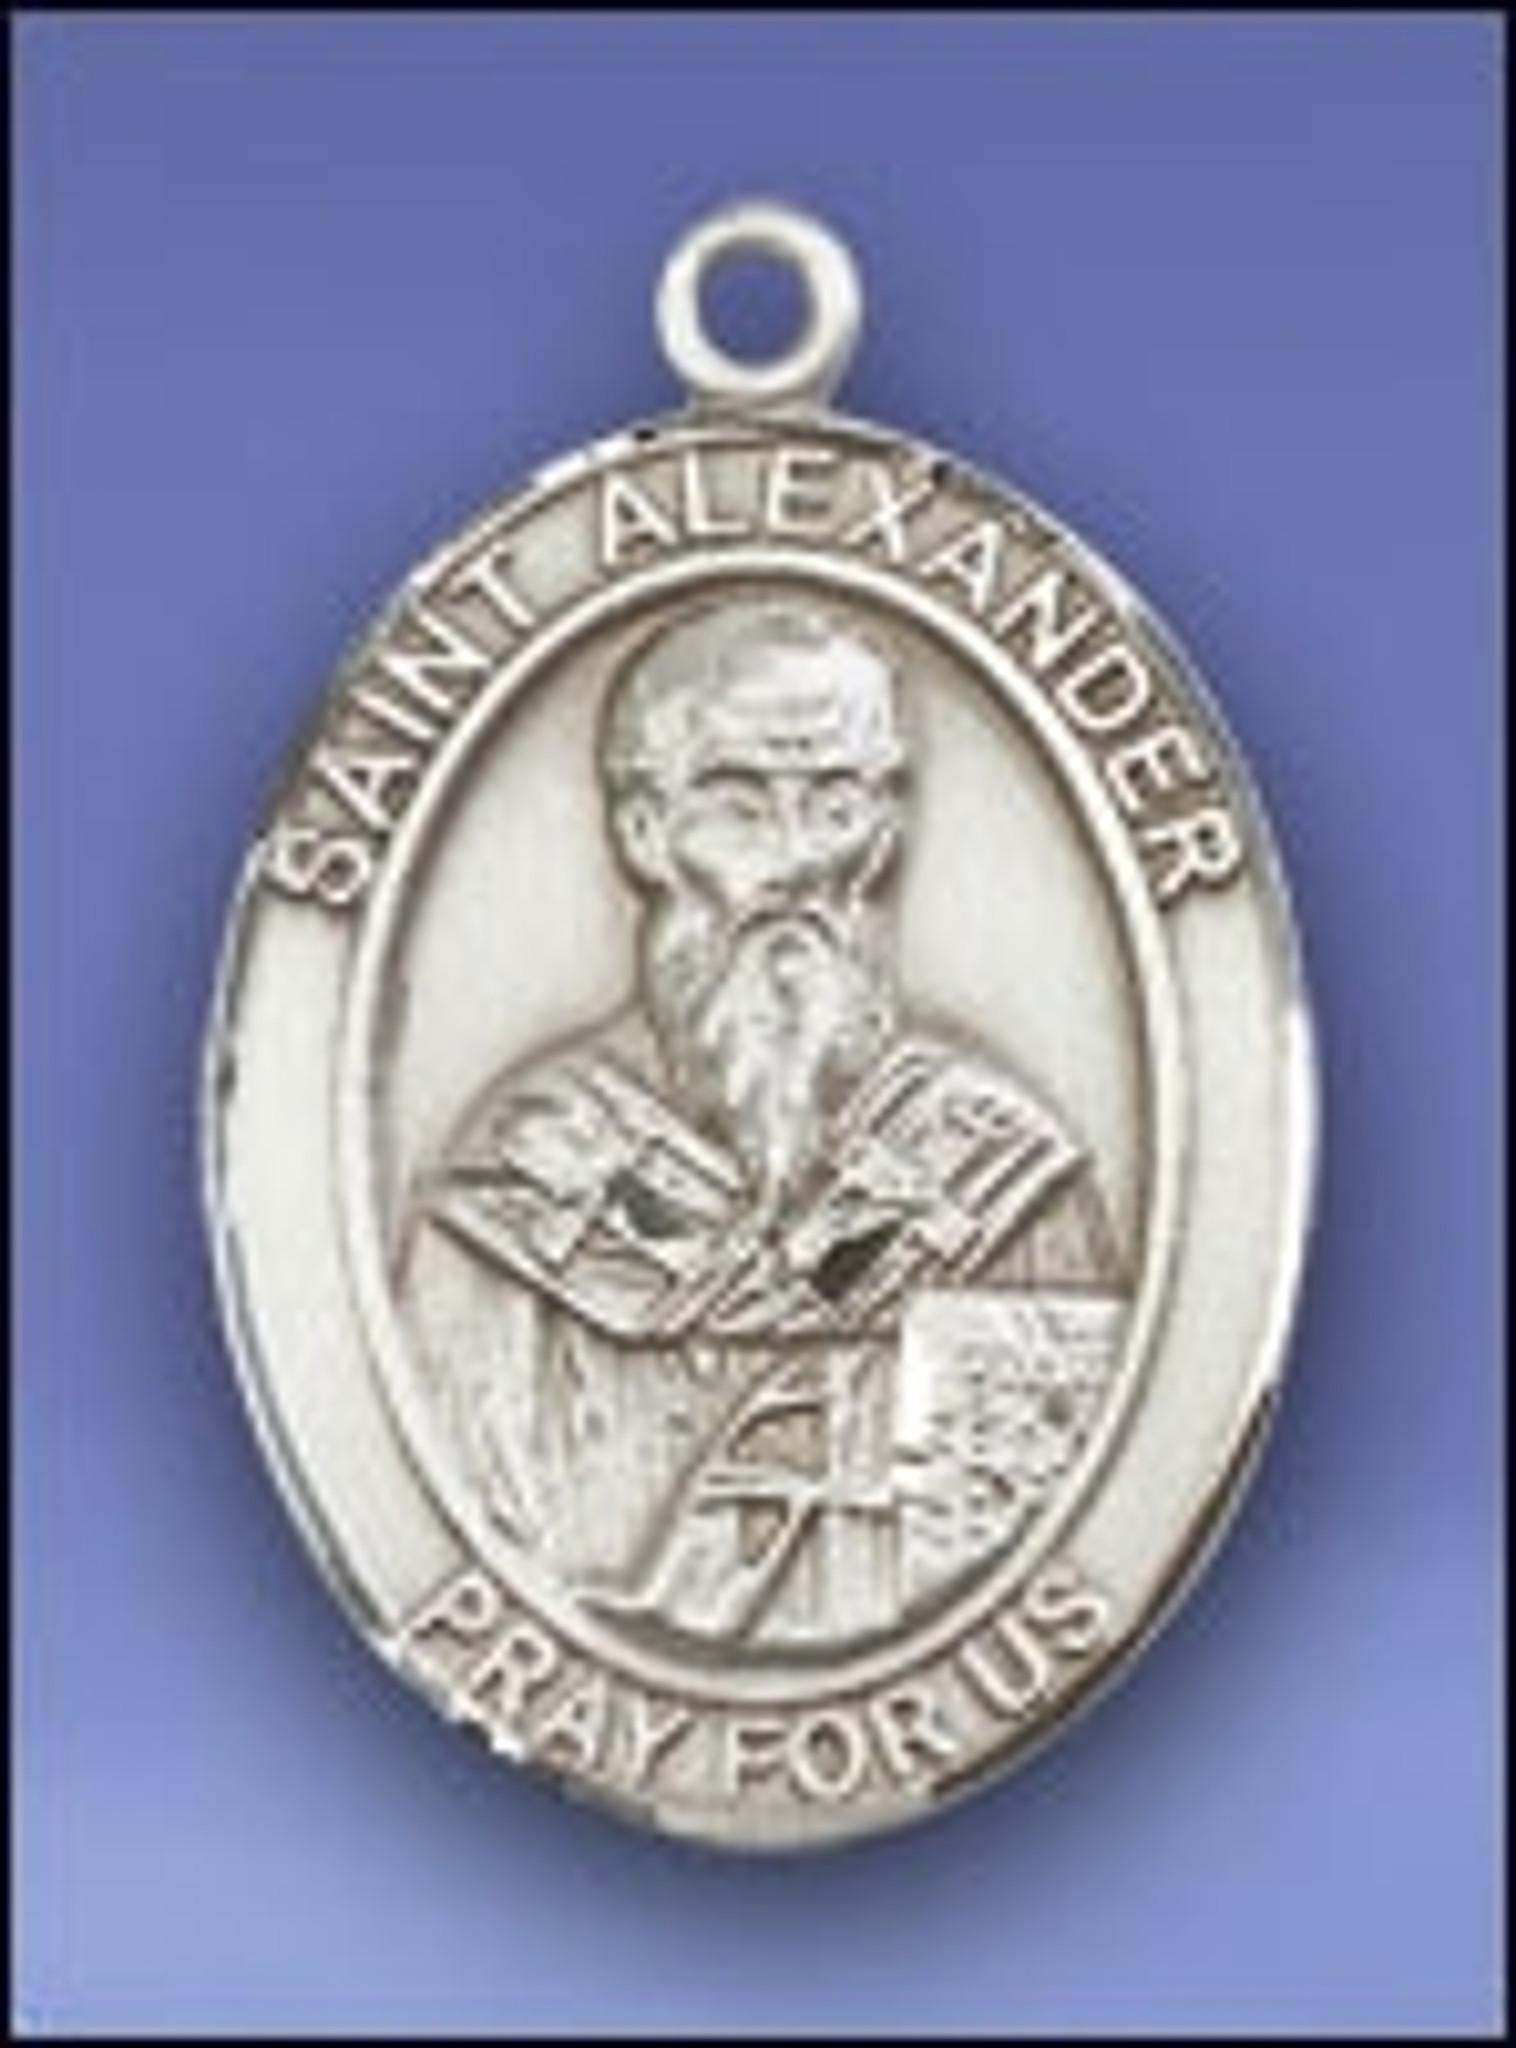 Alexander Sauli